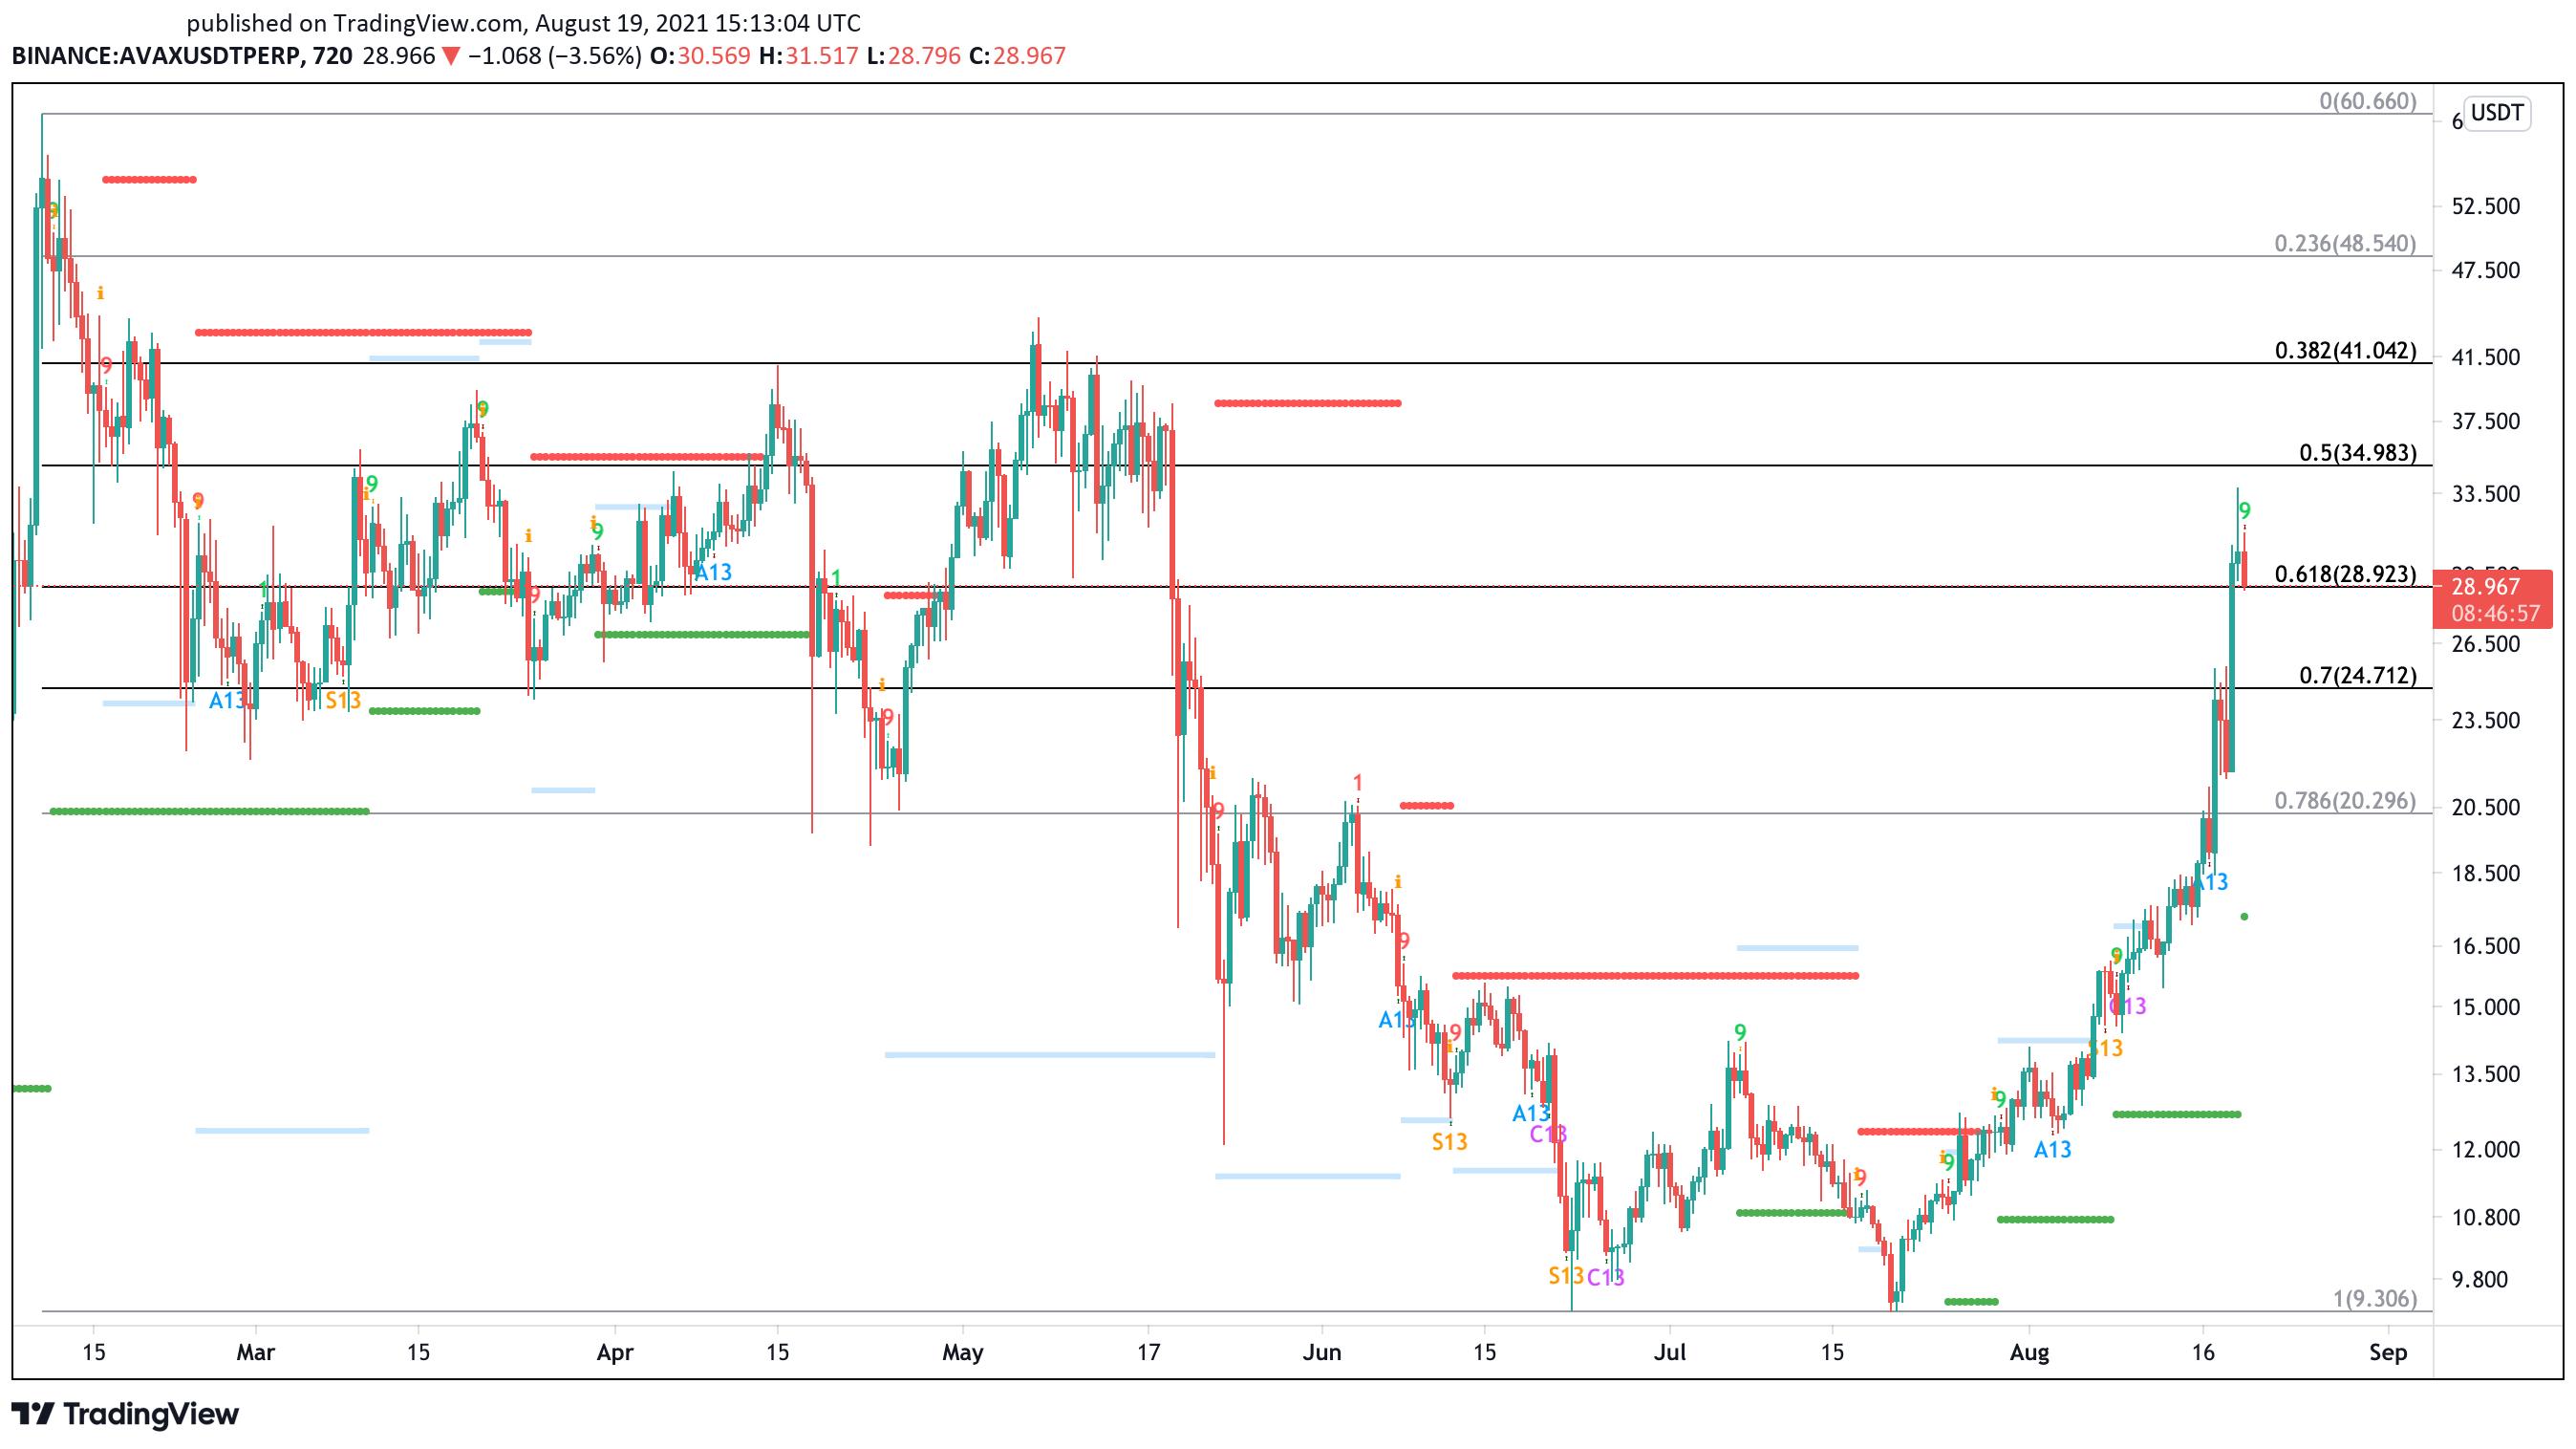 Avalanche US dollar price chart